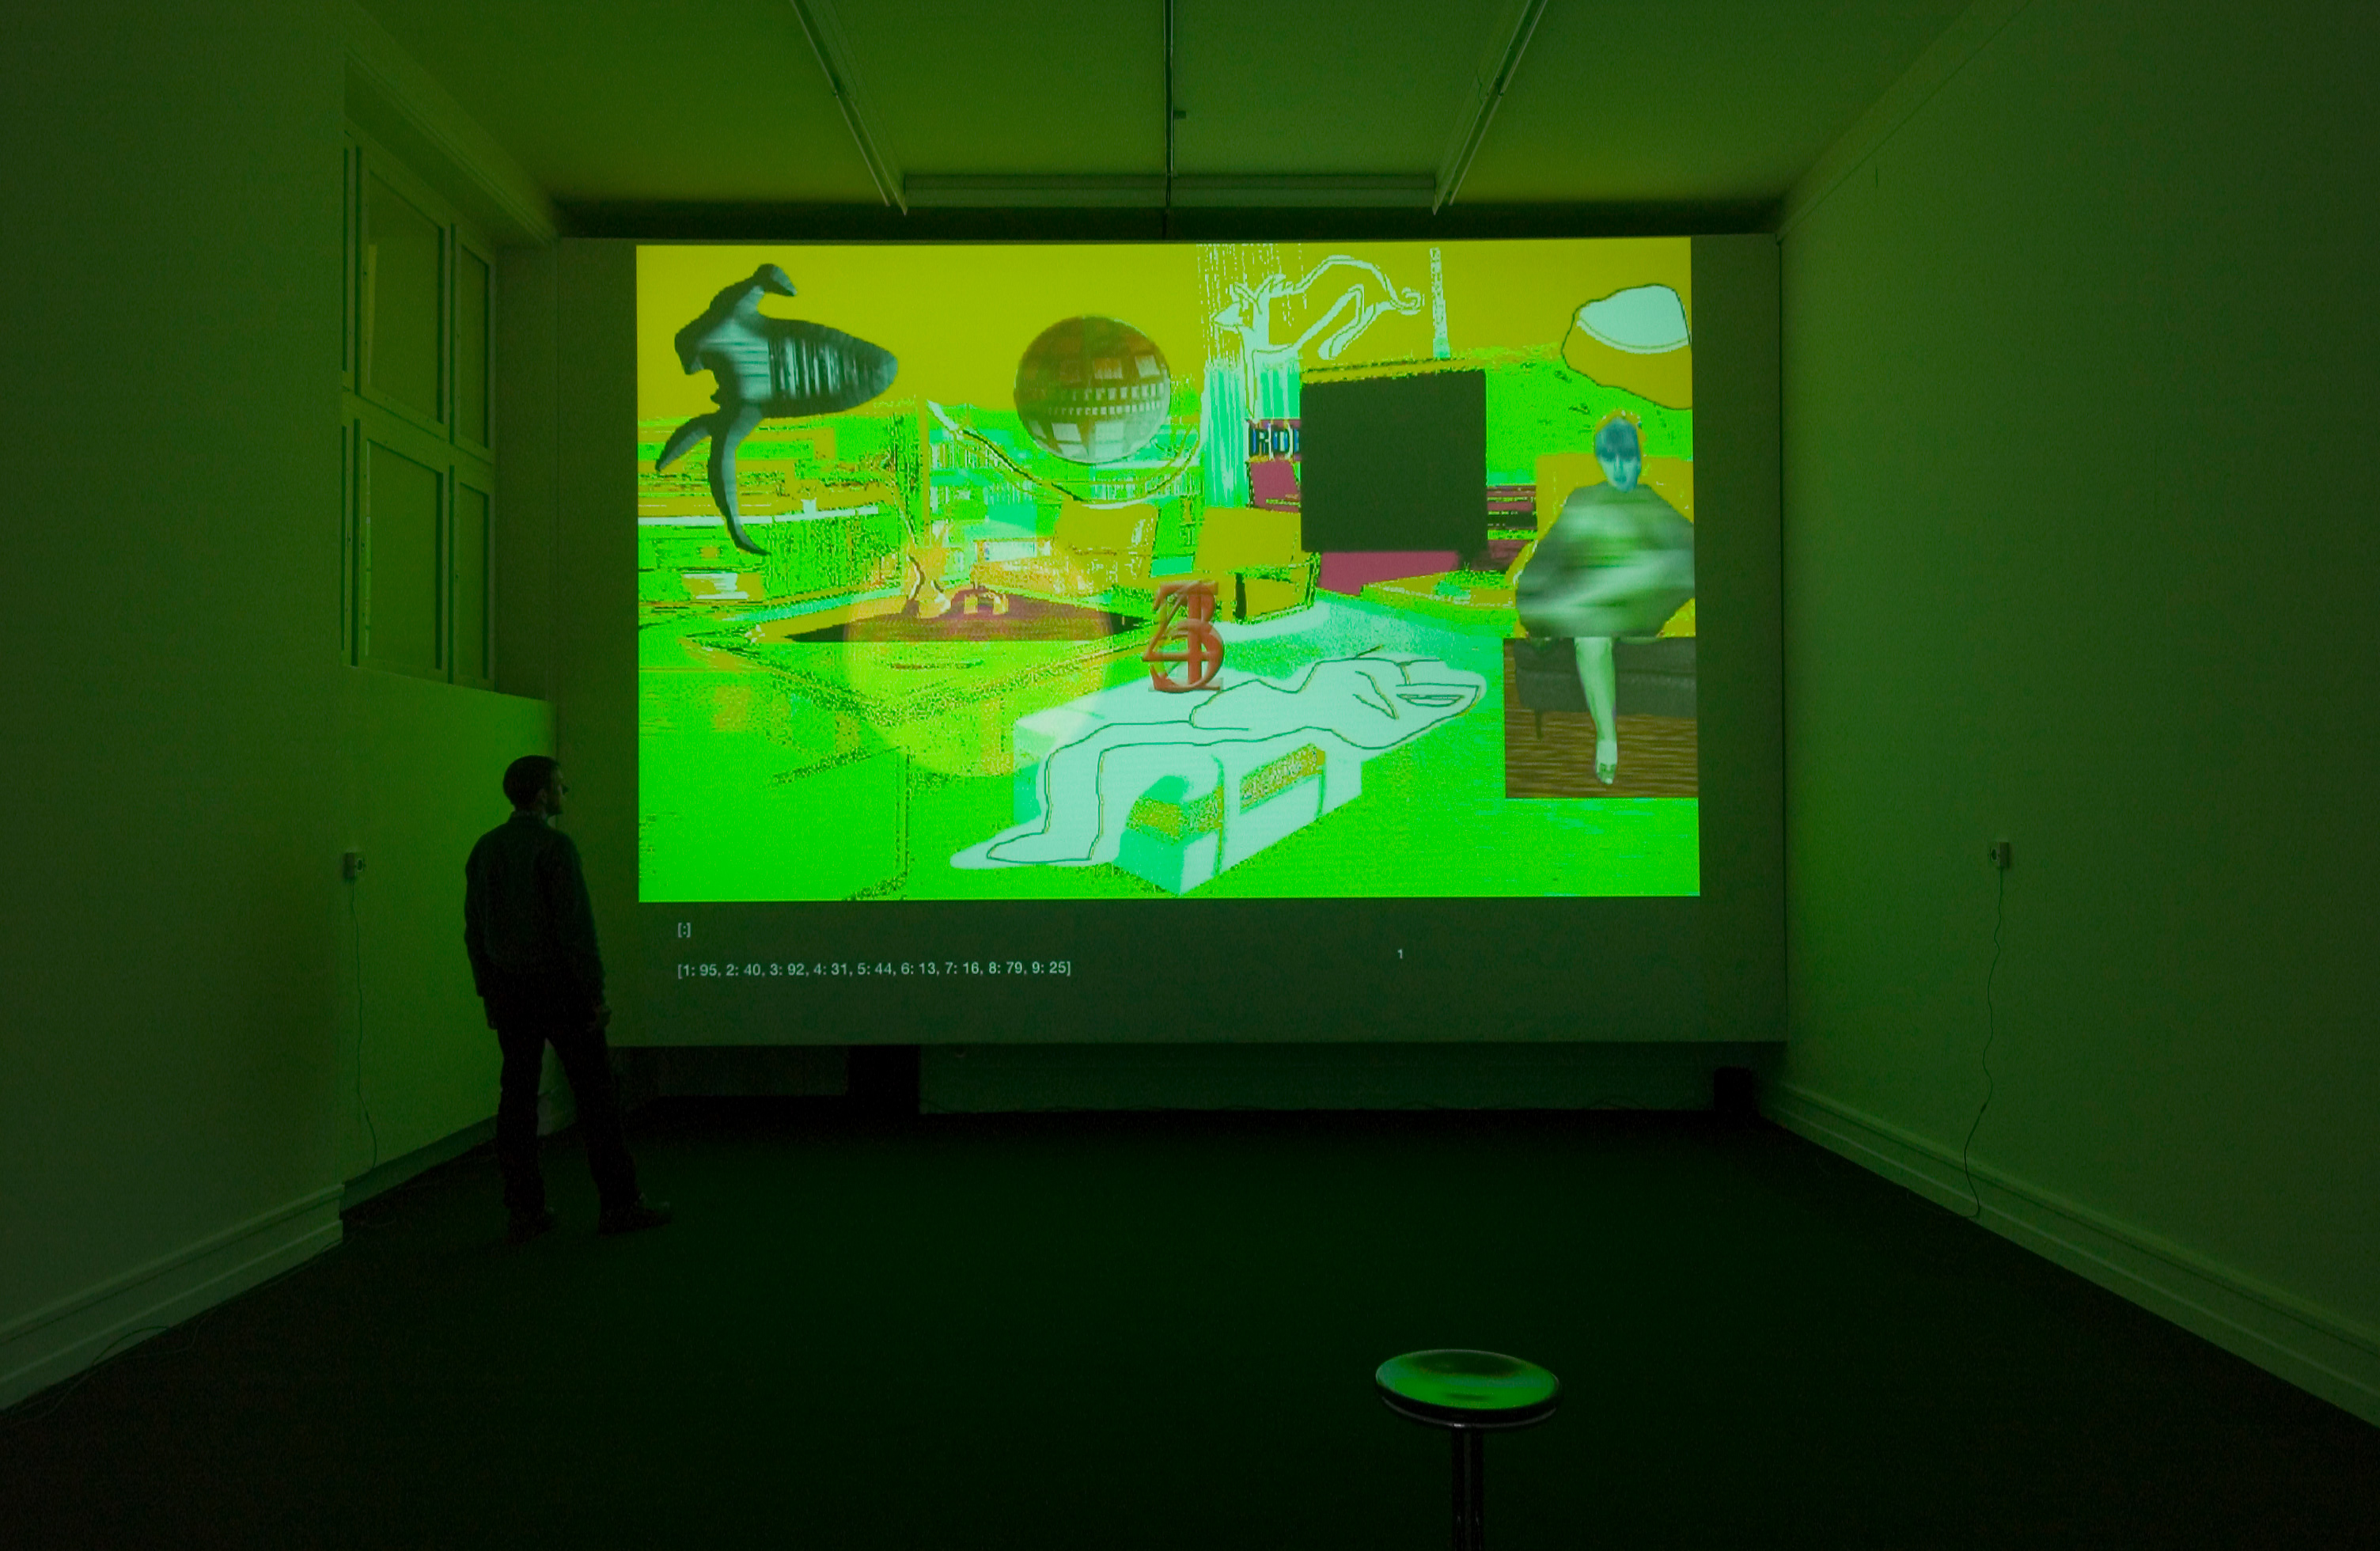 Galerie Barbara Thumm \ Anne-Mie Van Kerckhoven – EZFK